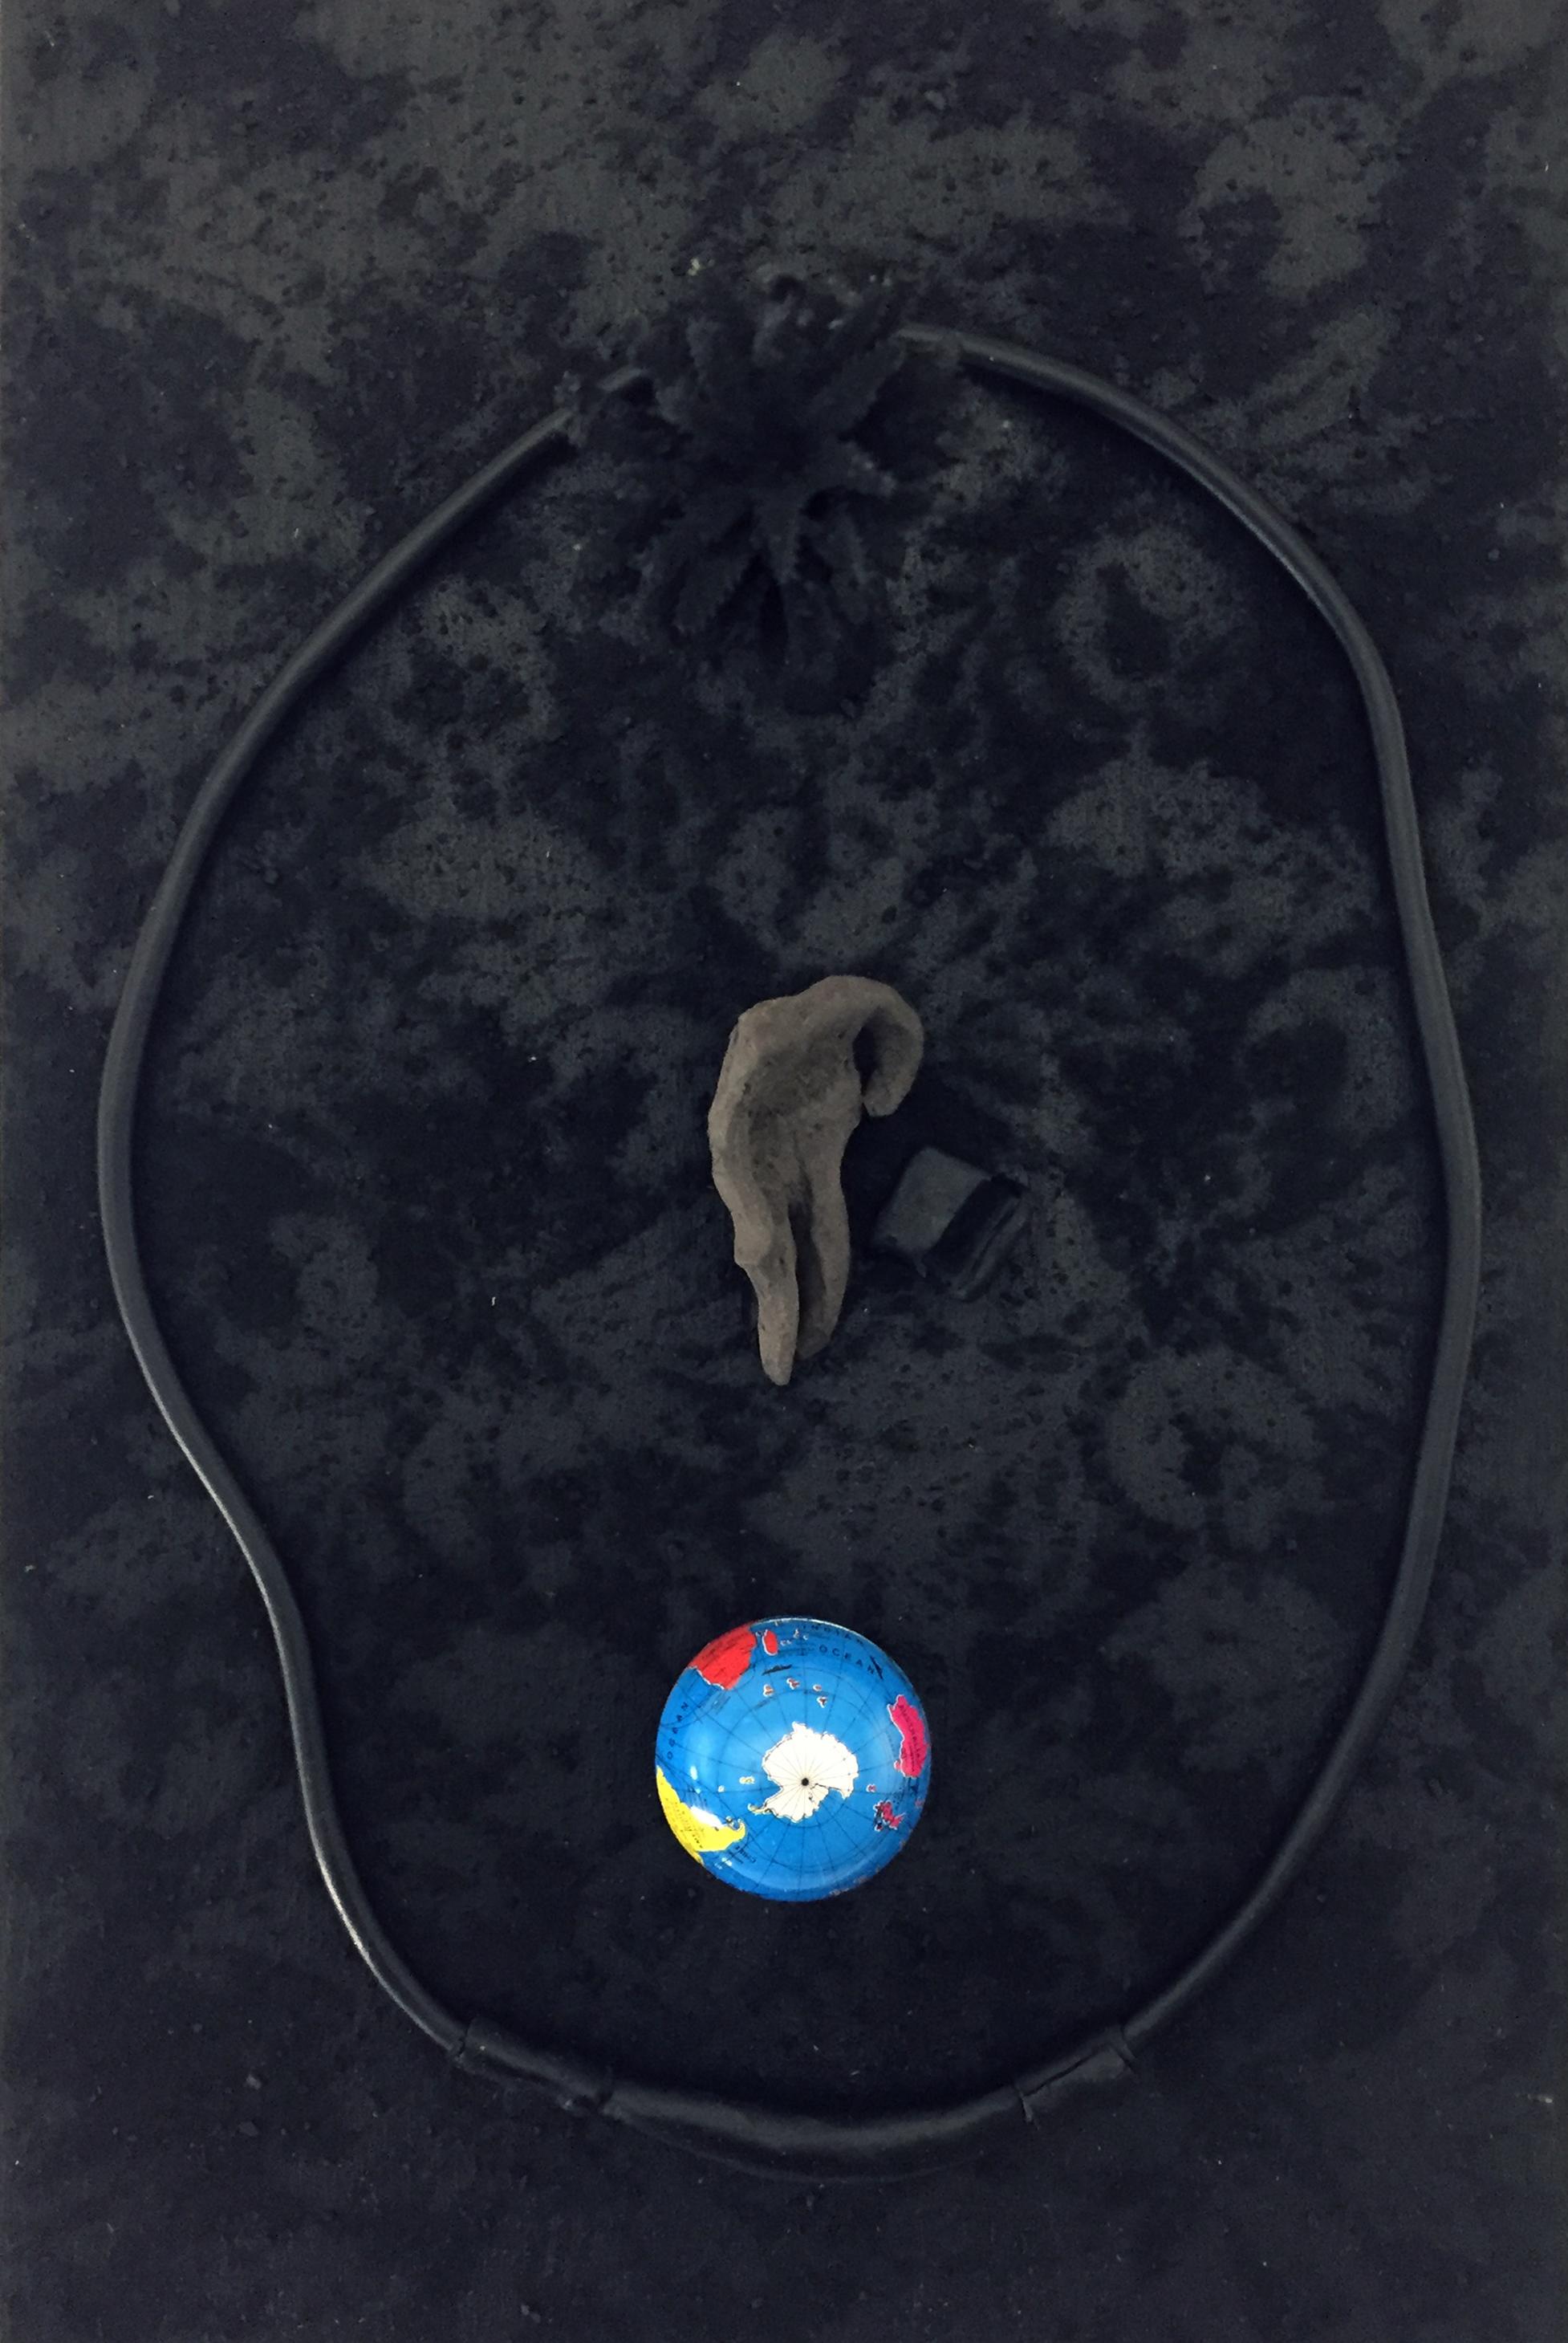 Naho Kawabe, Camera Isolata,2020, Objekt, Holz, Kohle, Ton, Acryl, Plastik, 20 x 30 x 10 cm_950€